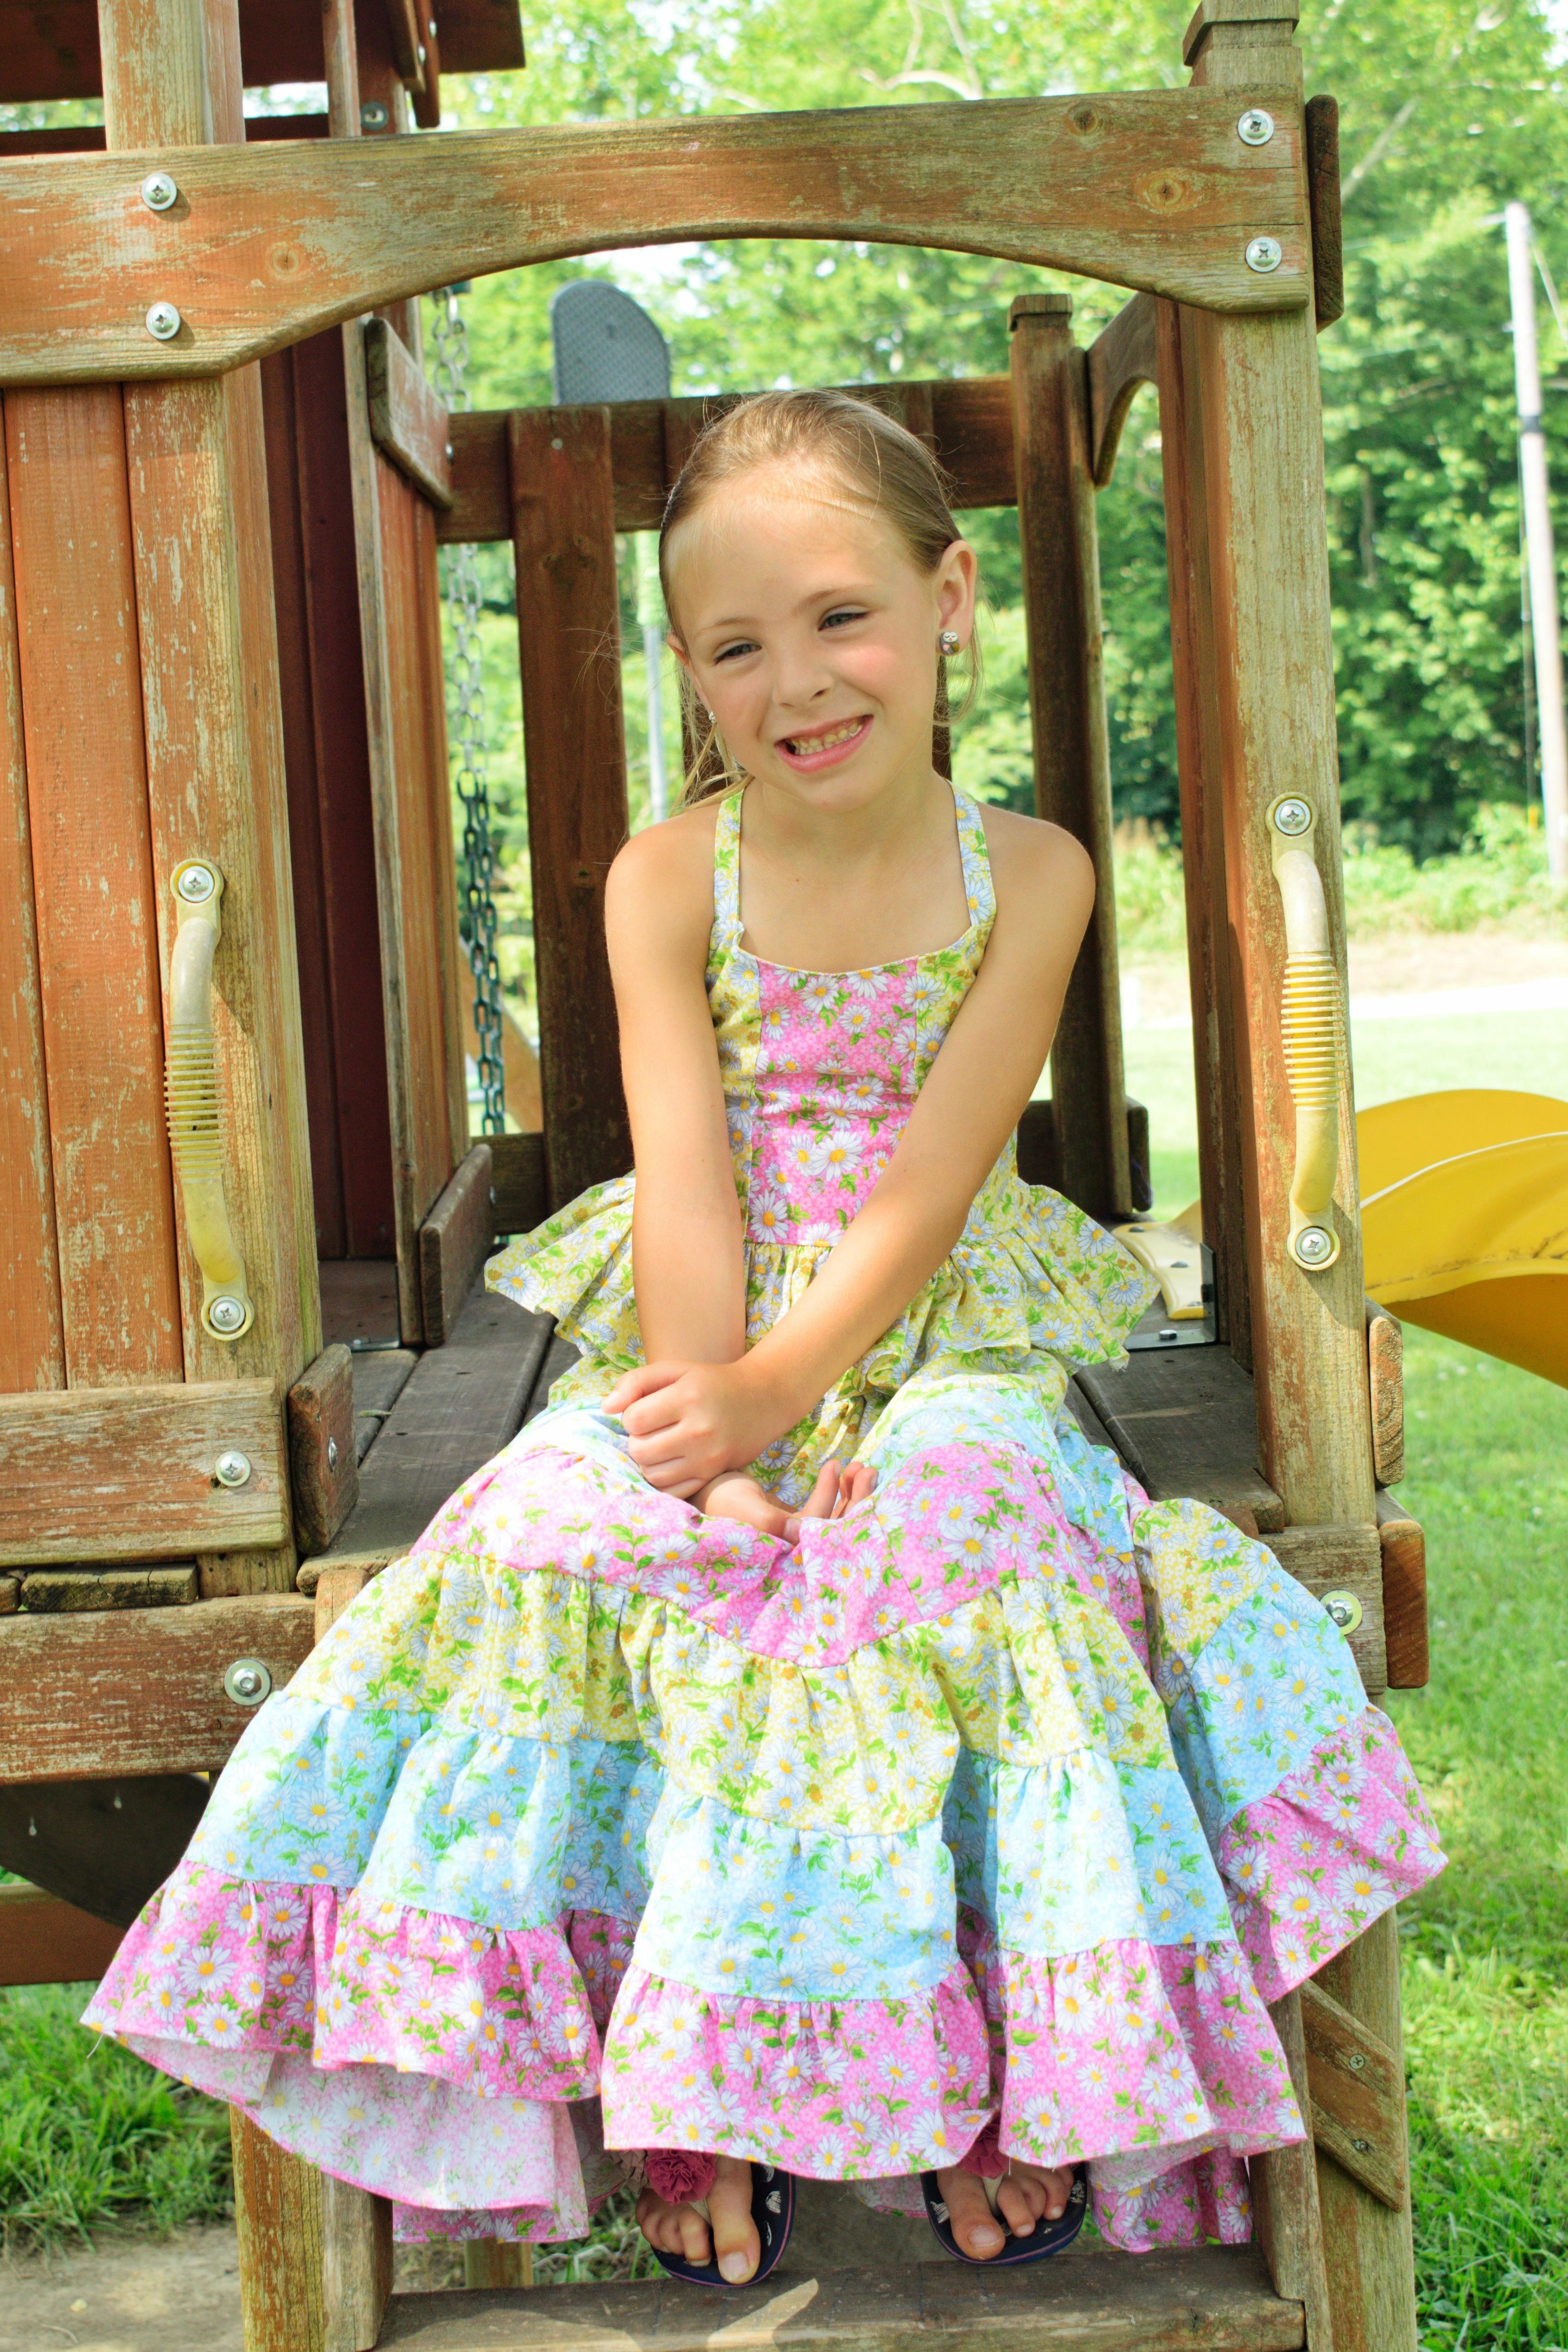 Prism Rainbow Skirt Sizes 2T to 14 Kids PDF Pattern